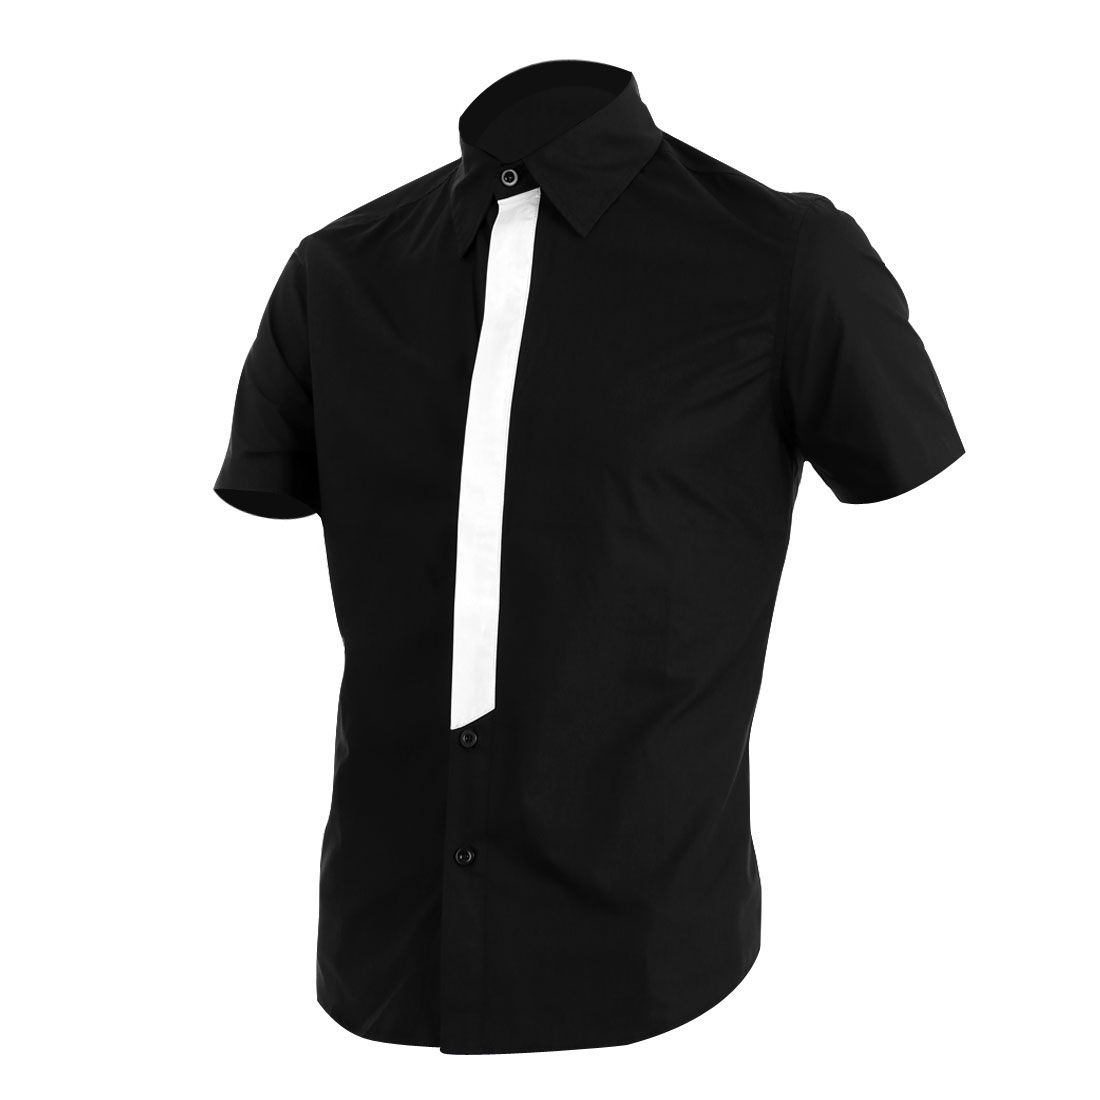 Men Point Collar Single Breasted Short Sleeve Round Hem Shirt Black M